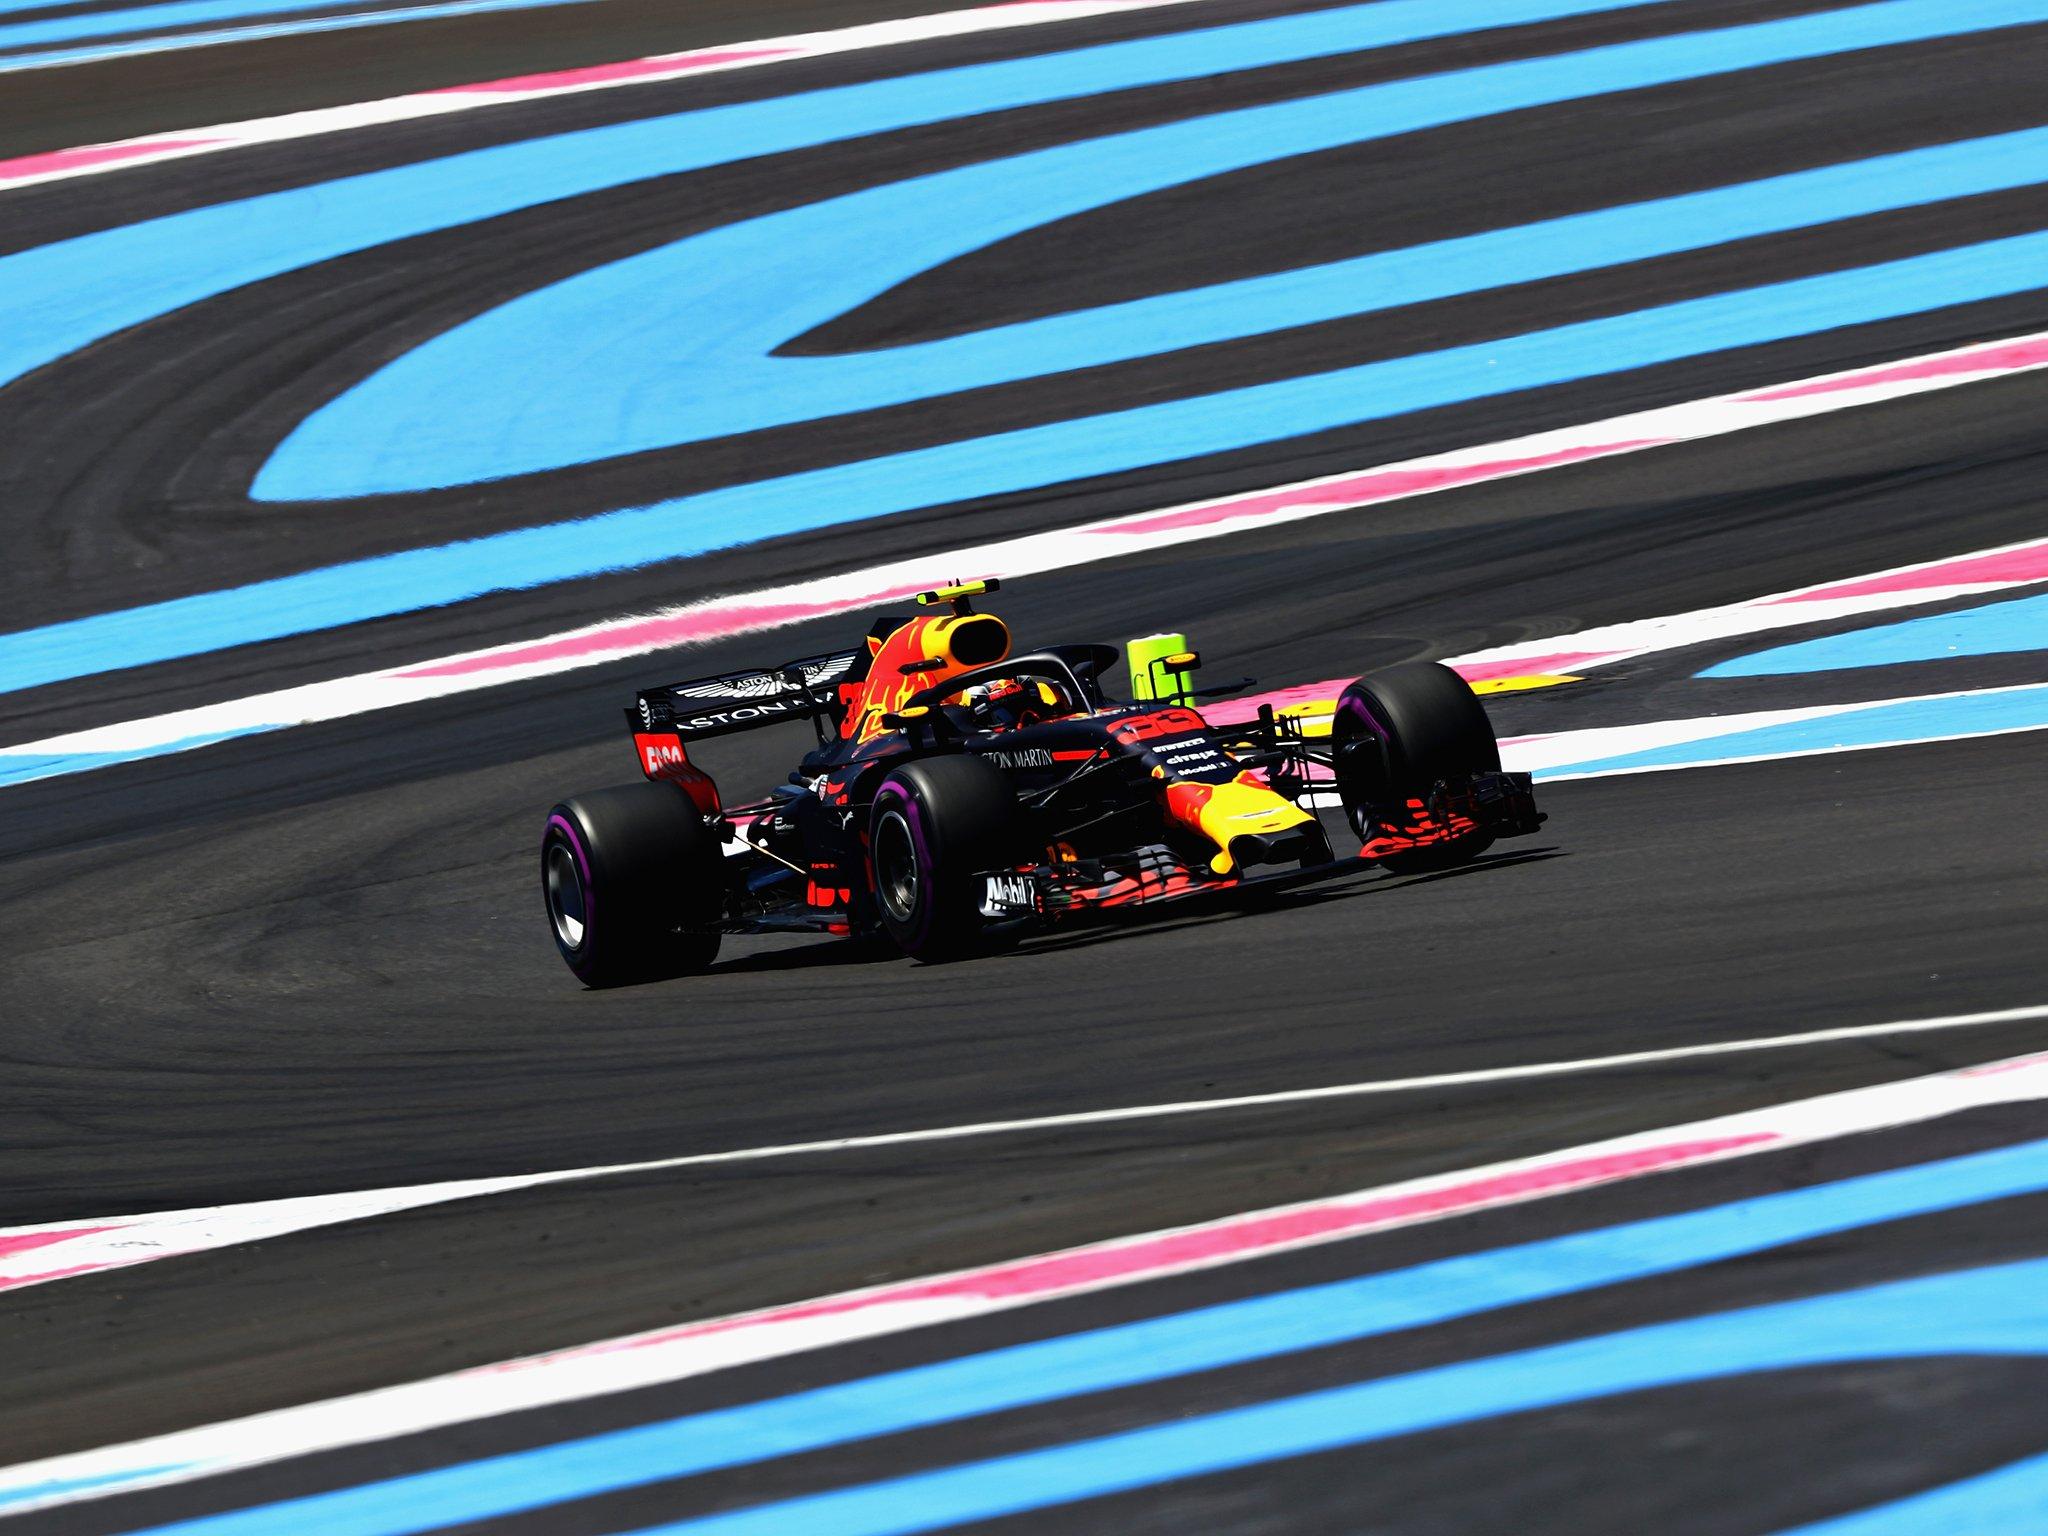 F1 Screening | French Grand Prix